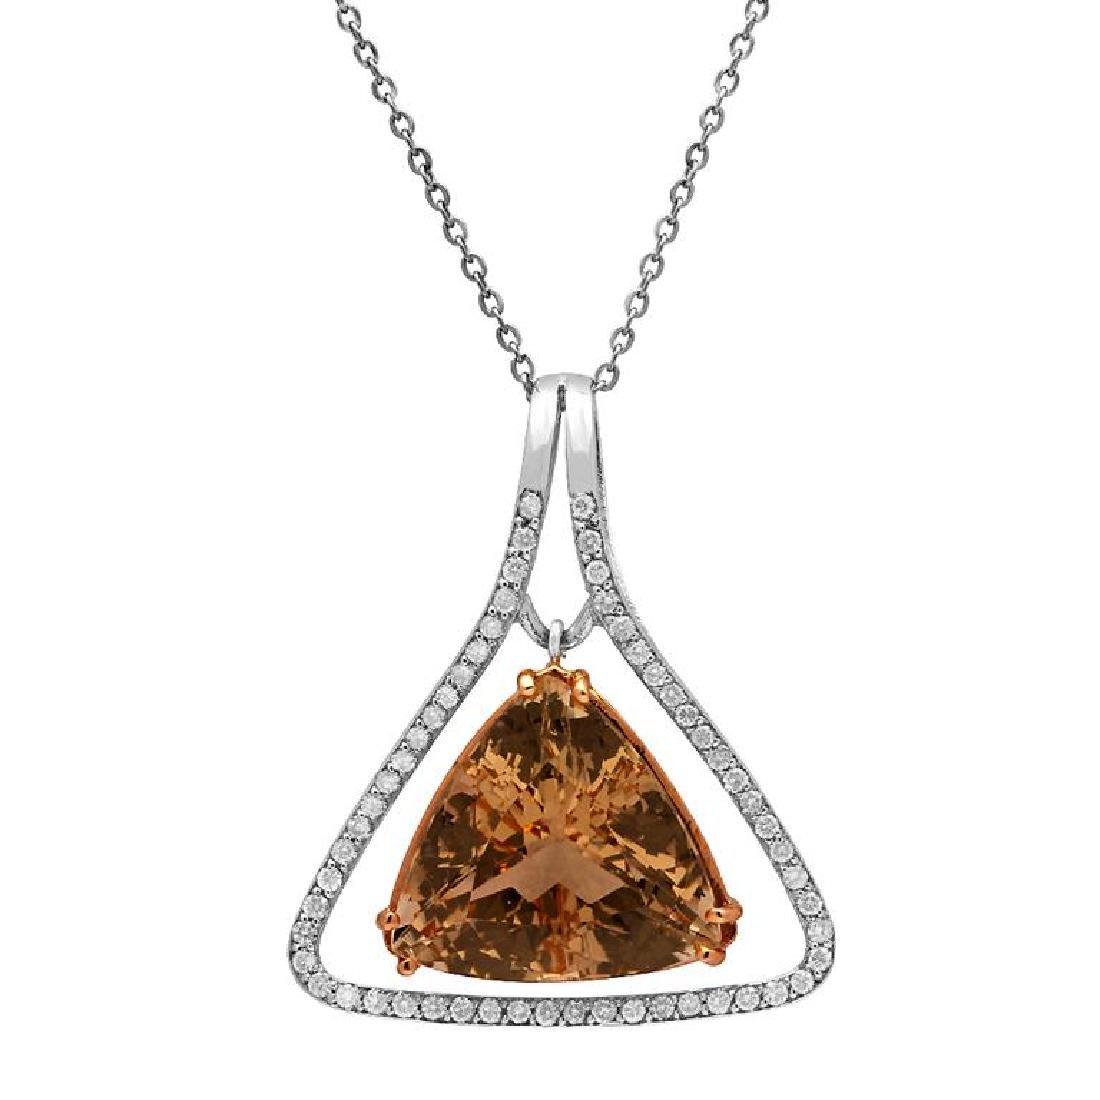 14k White Gold 23.65ct Morganite 1.09ct Diamond Pendant